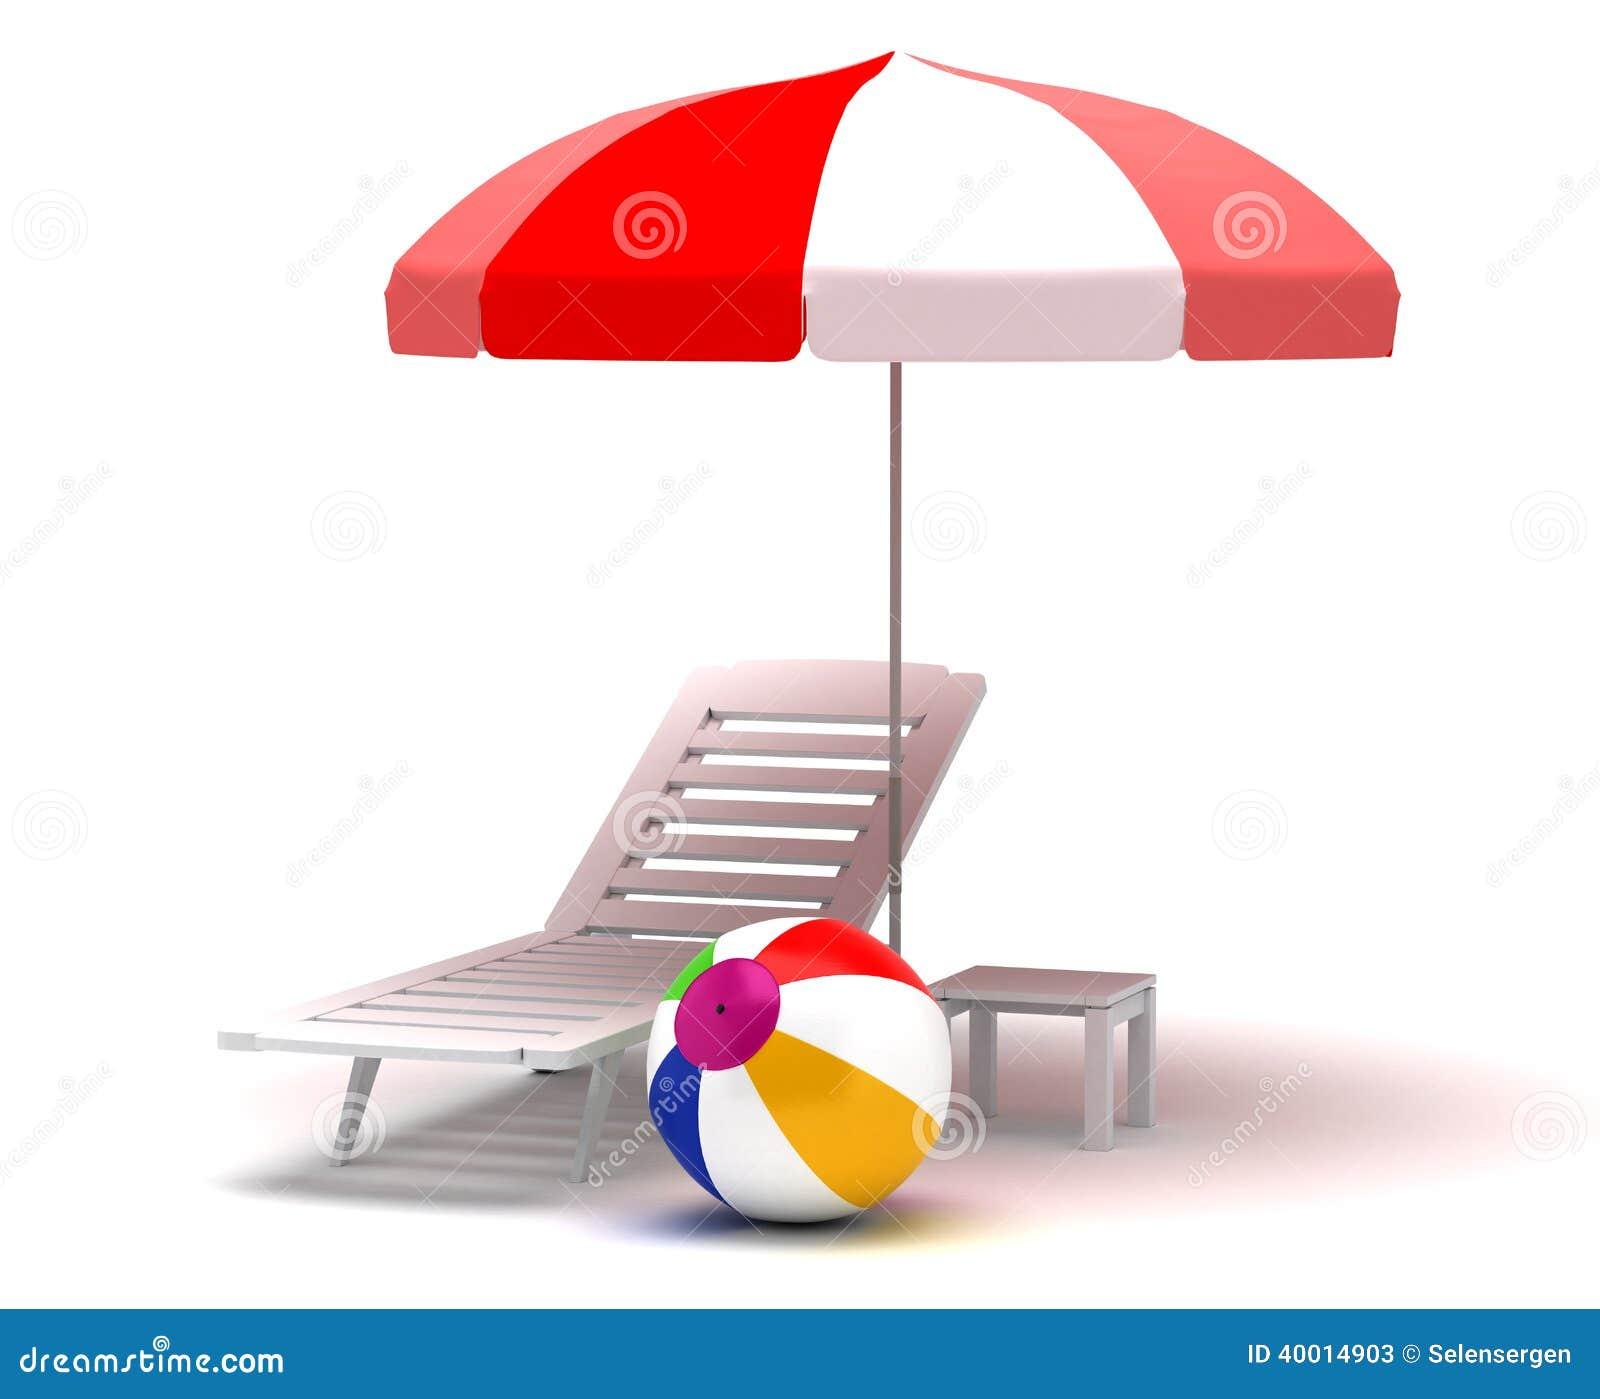 Beach chair and umbrella stock illustration image 40014903